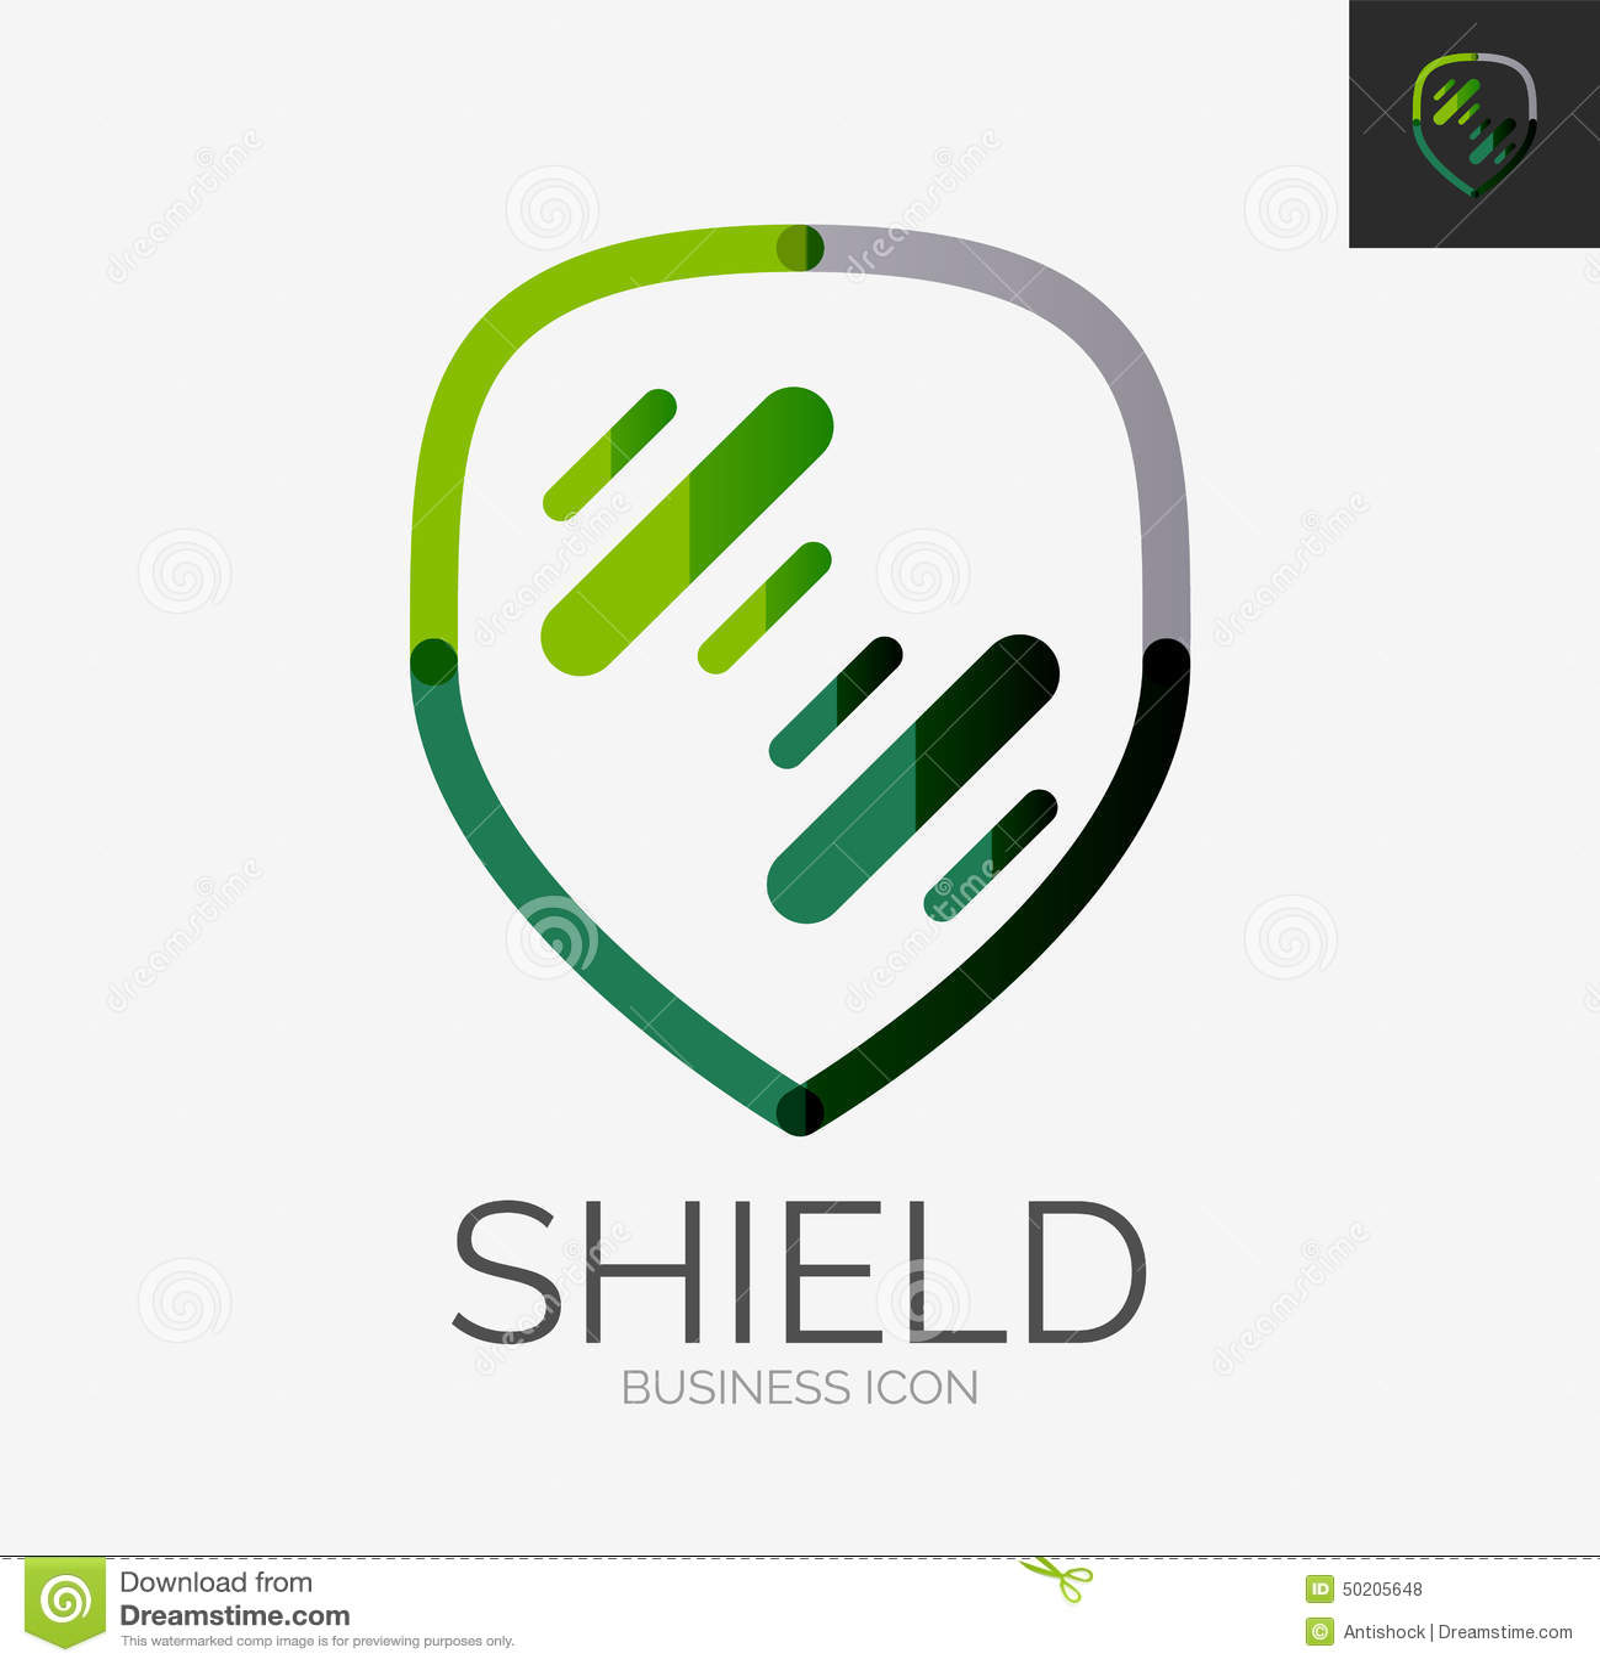 Line Logo Design : Minimal line design logo shield icon vector illustration